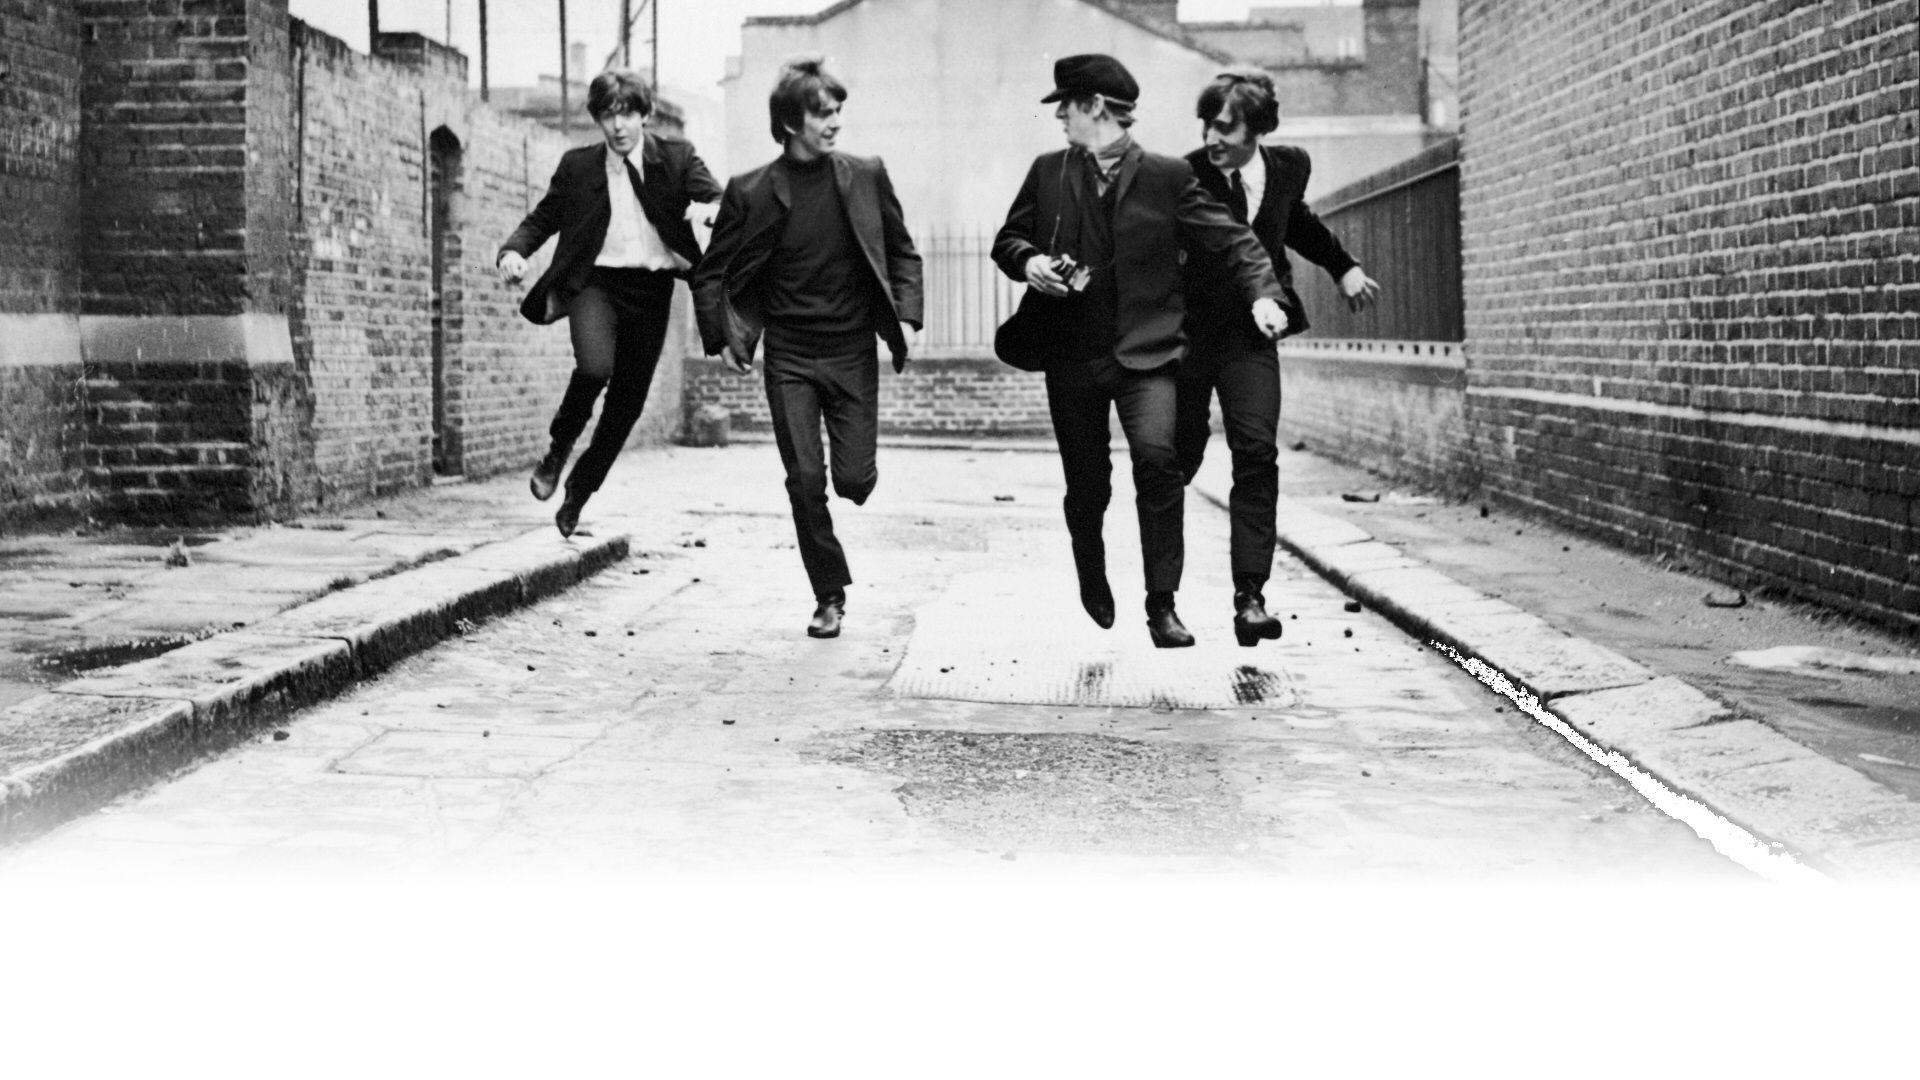 1920x1080 Wallpaper the beatles, band, members, run, road